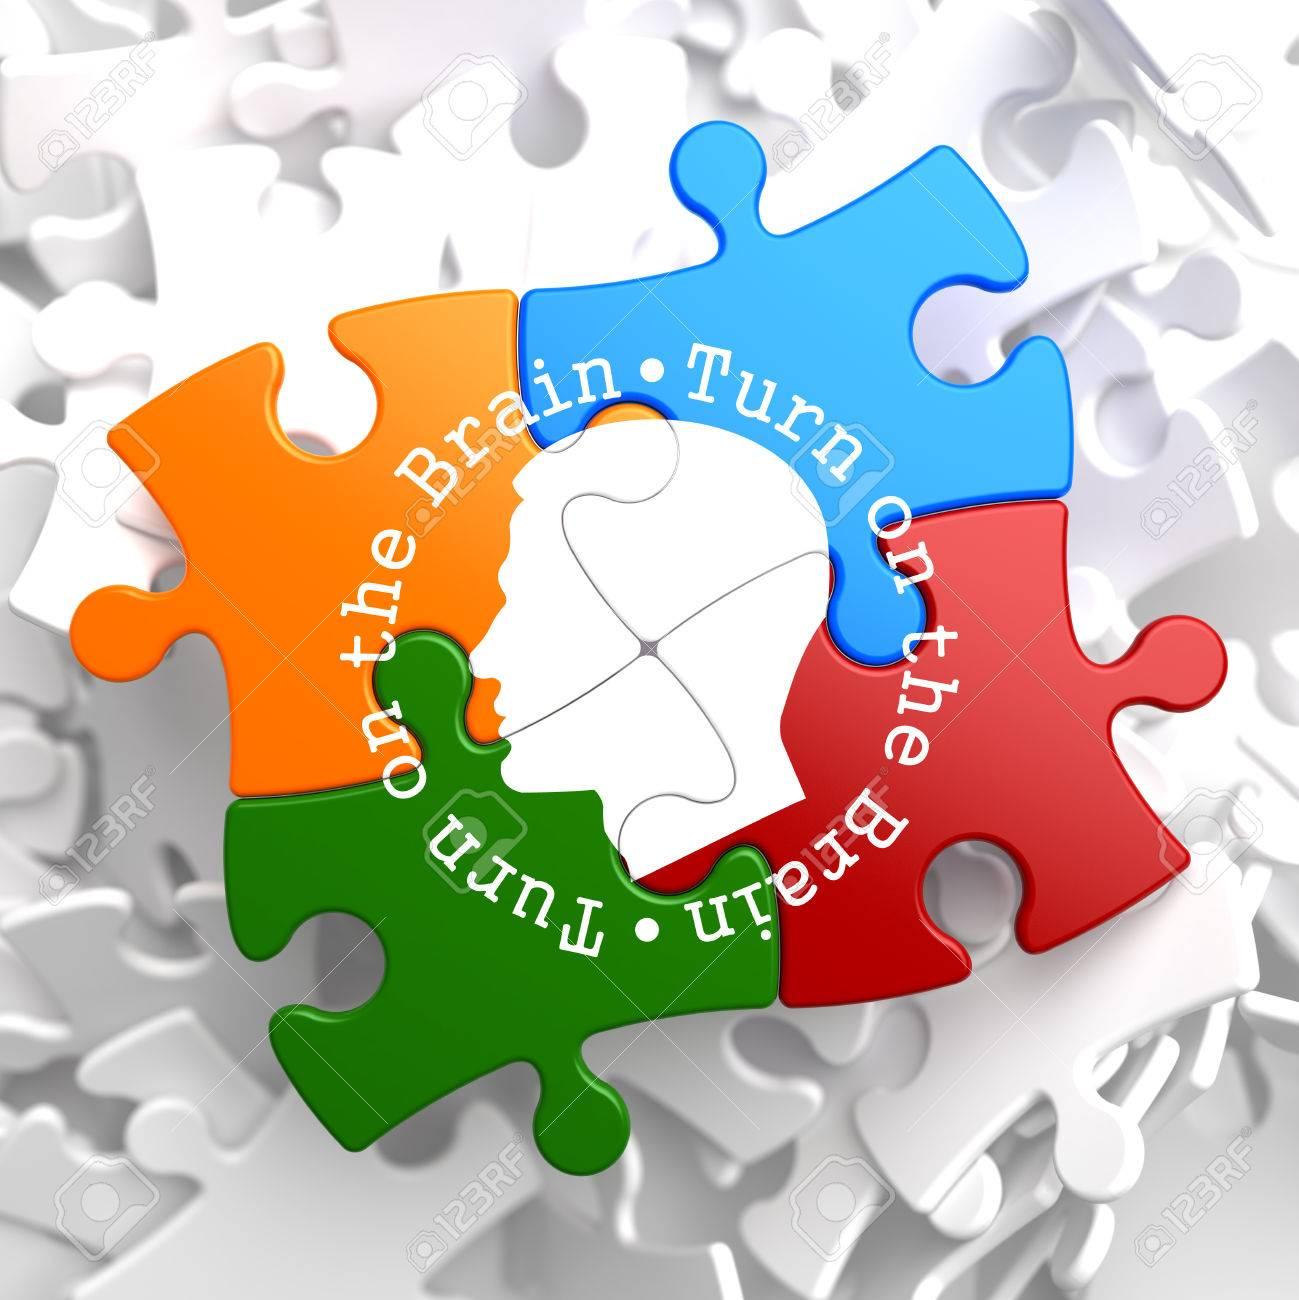 Turn On the Brain Written Arround Human Head Icon on Multicolor Puzzle. Stock Photo - 23101587